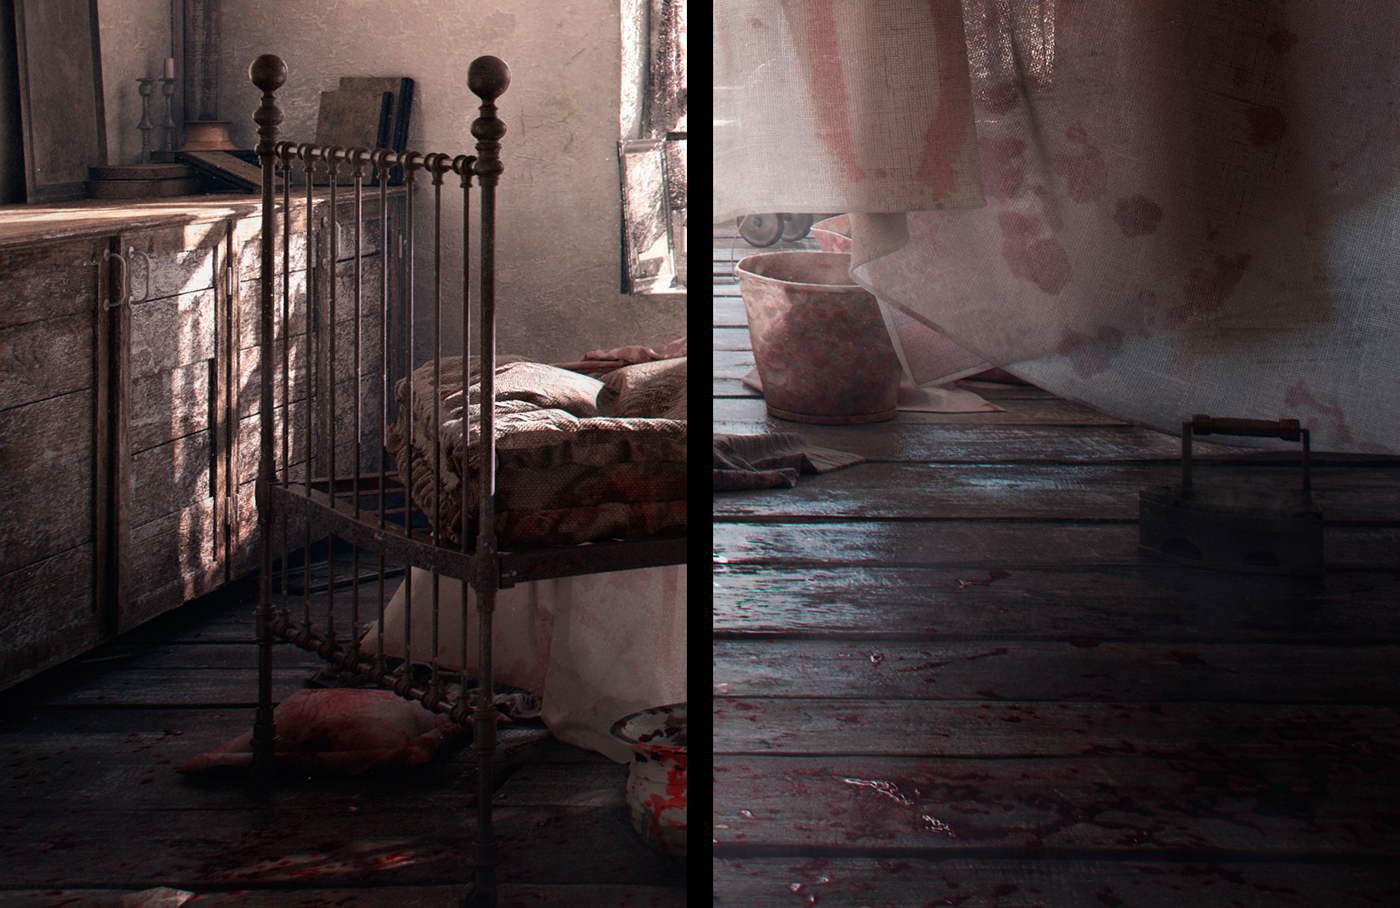 3D old somber gloomy art 3D illustration 3ds max photoshop house old interior Victorian House Victorian Era nostalgia dark suicide